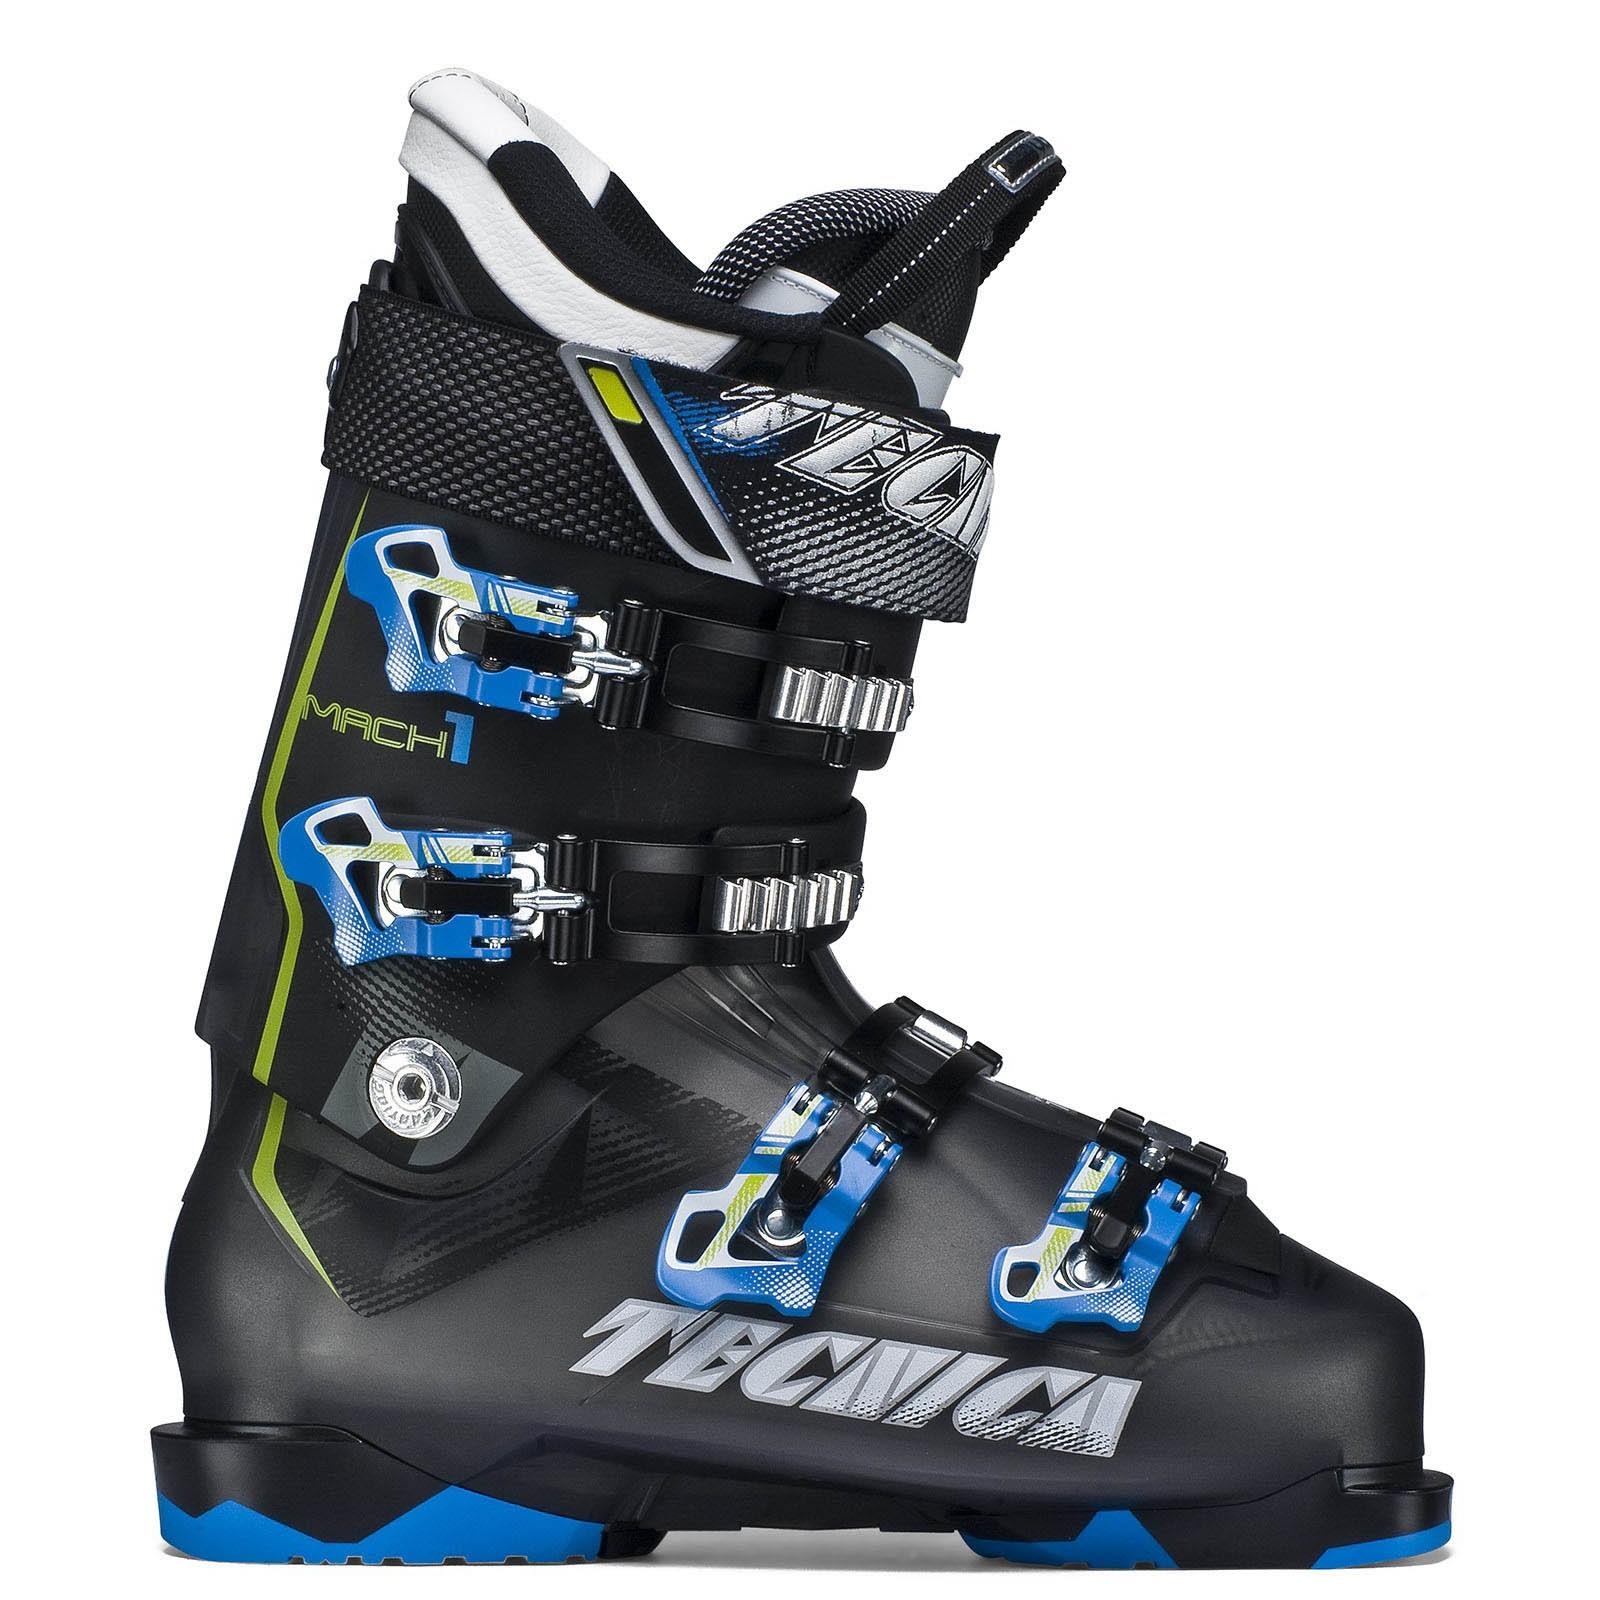 Ski Boots   Tecnica Mach1 100   Ski